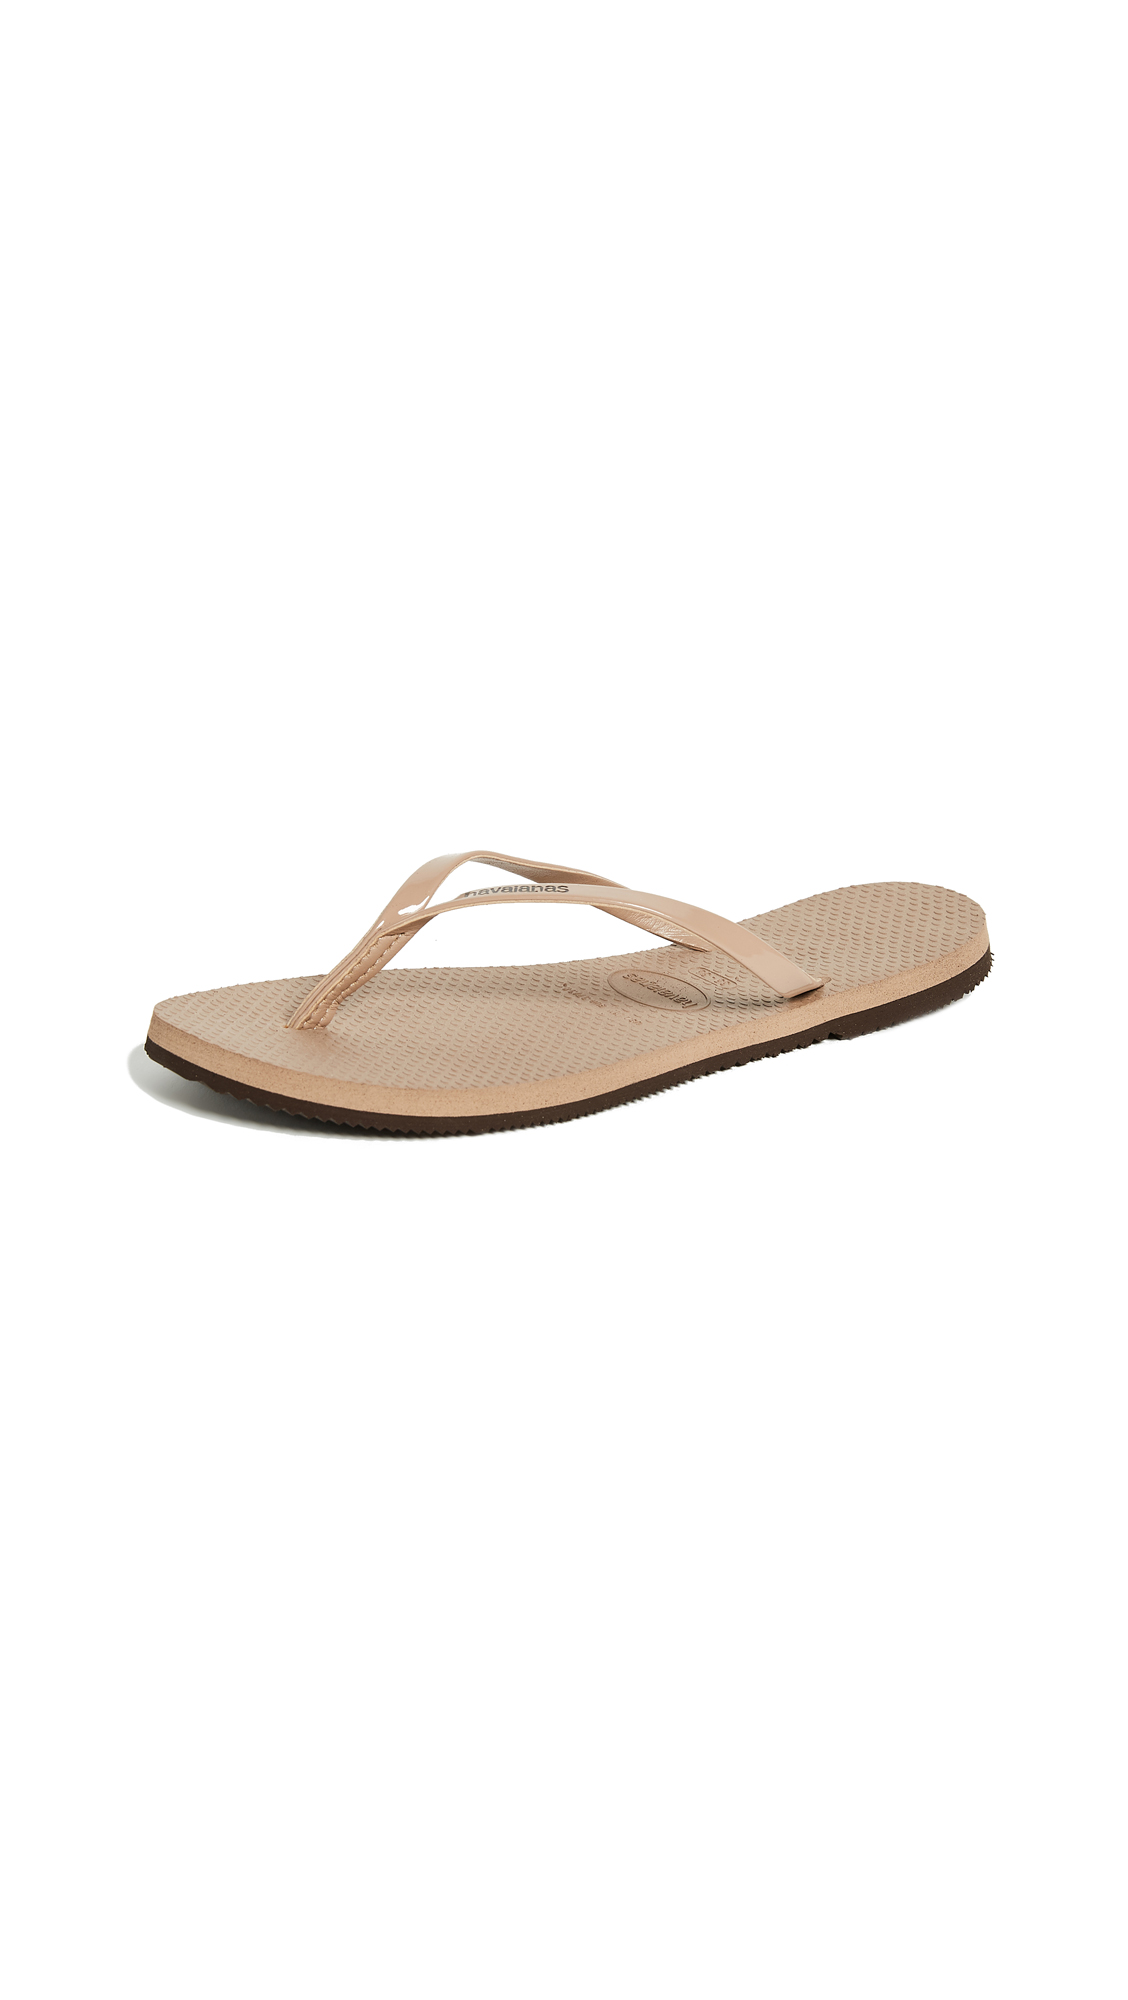 Havaianas You Metallic Flip Flops - Rose Gold